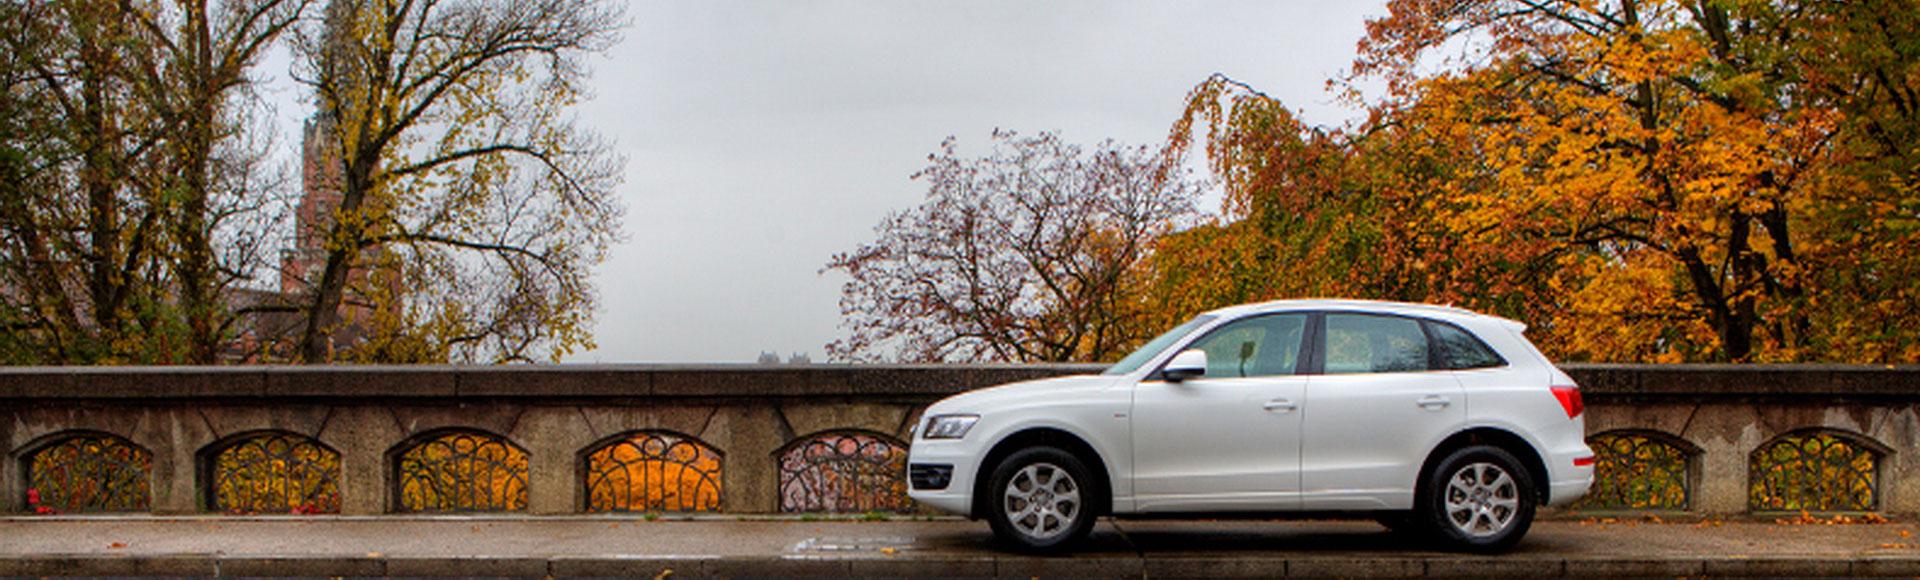 Audi Q5 2009 Herbst